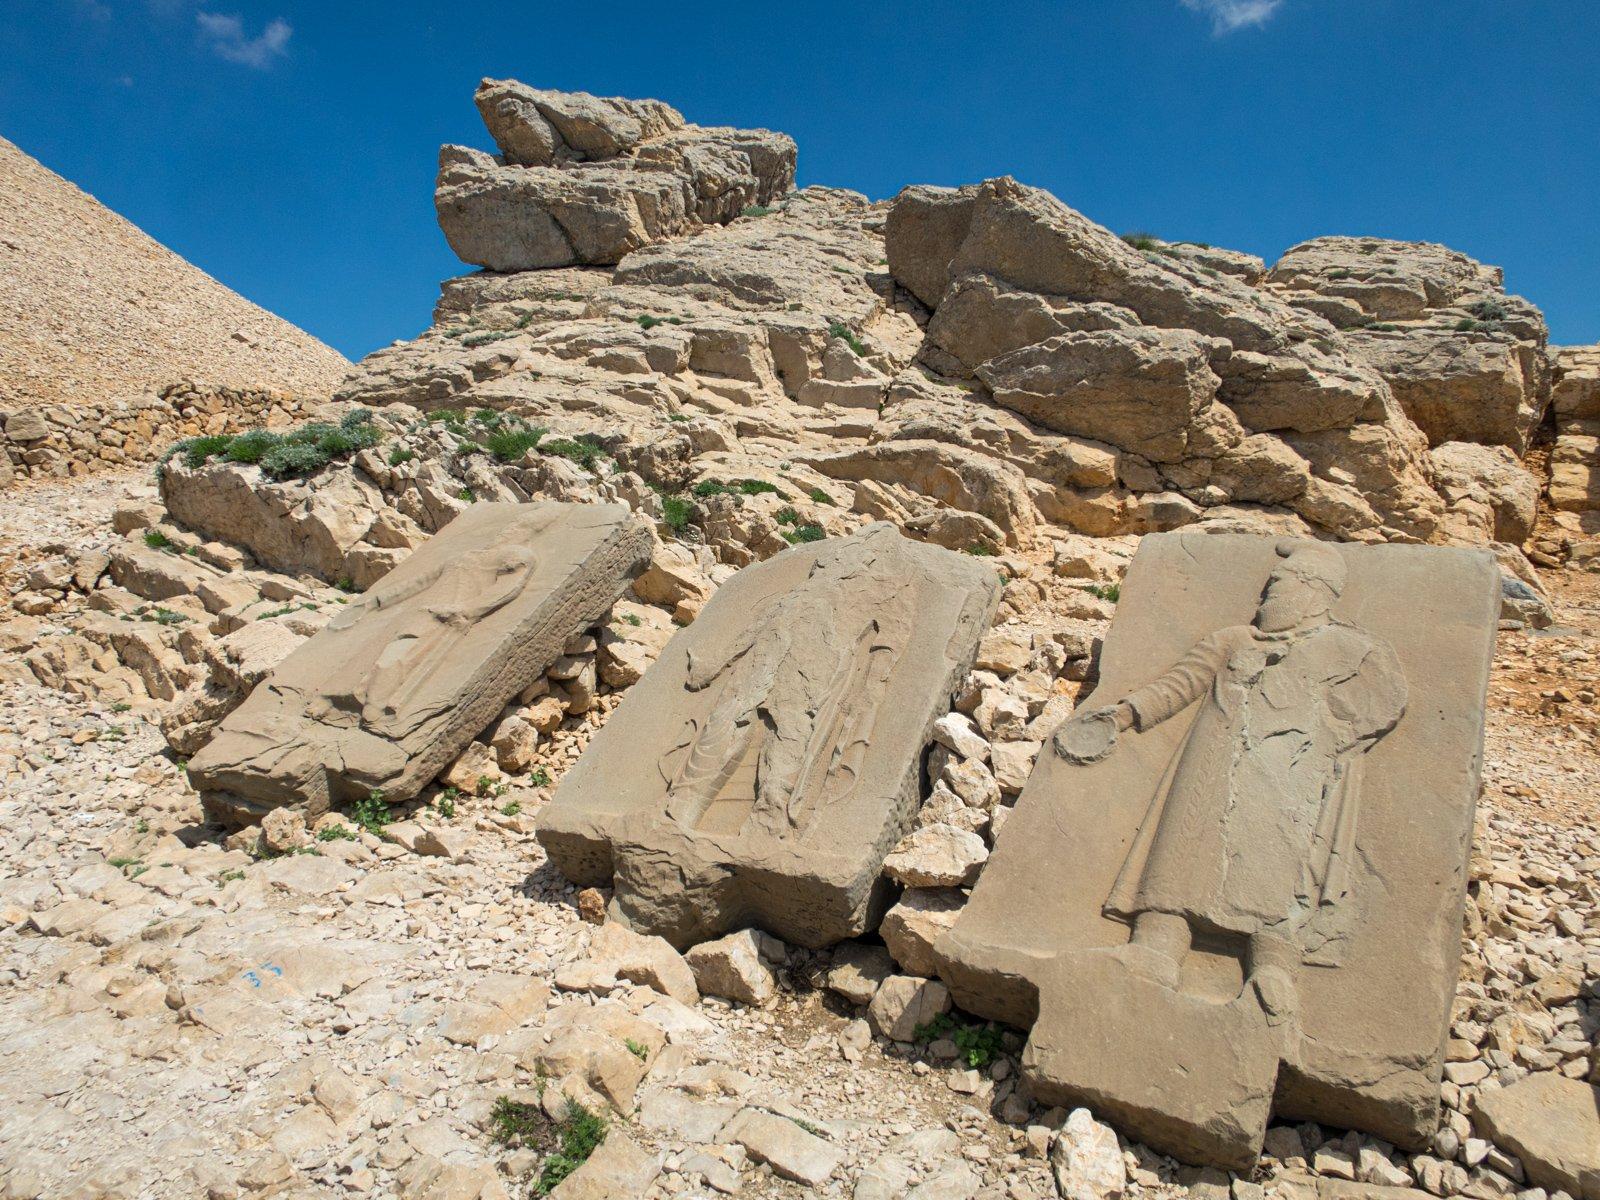 Sandstone Stele